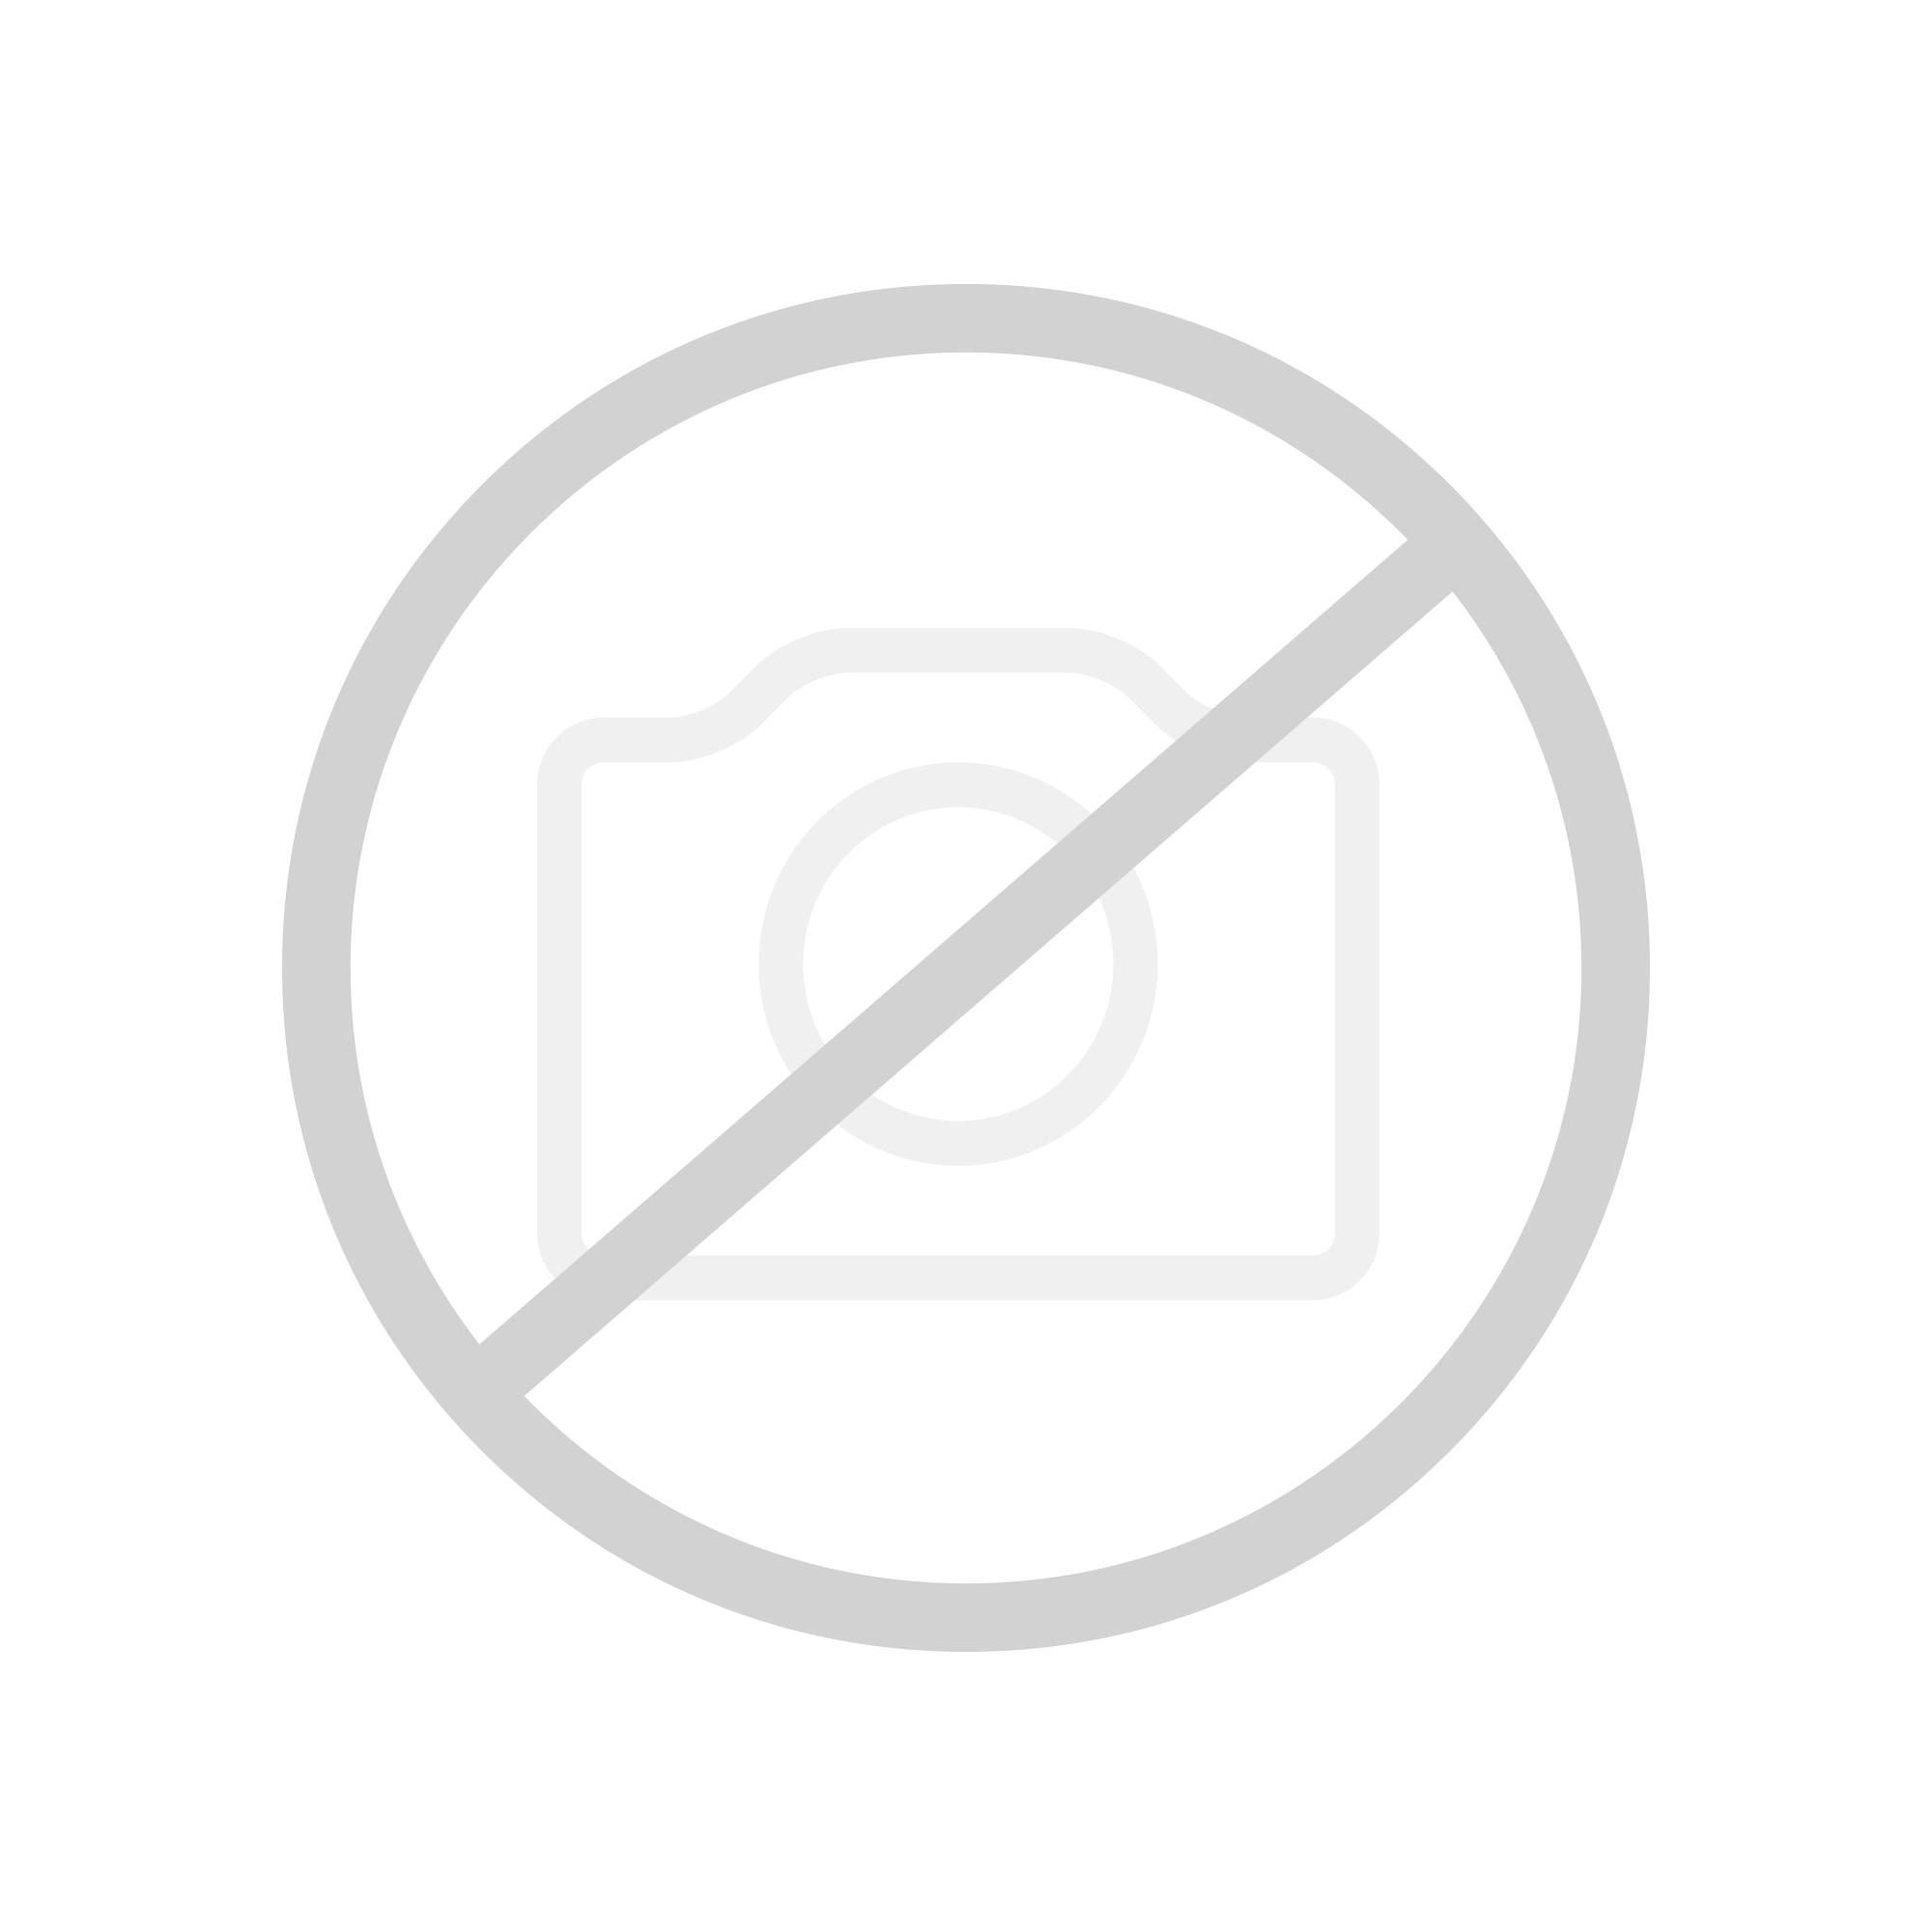 sitzm bel f r drinnen und drau en reuter onlineshop. Black Bedroom Furniture Sets. Home Design Ideas